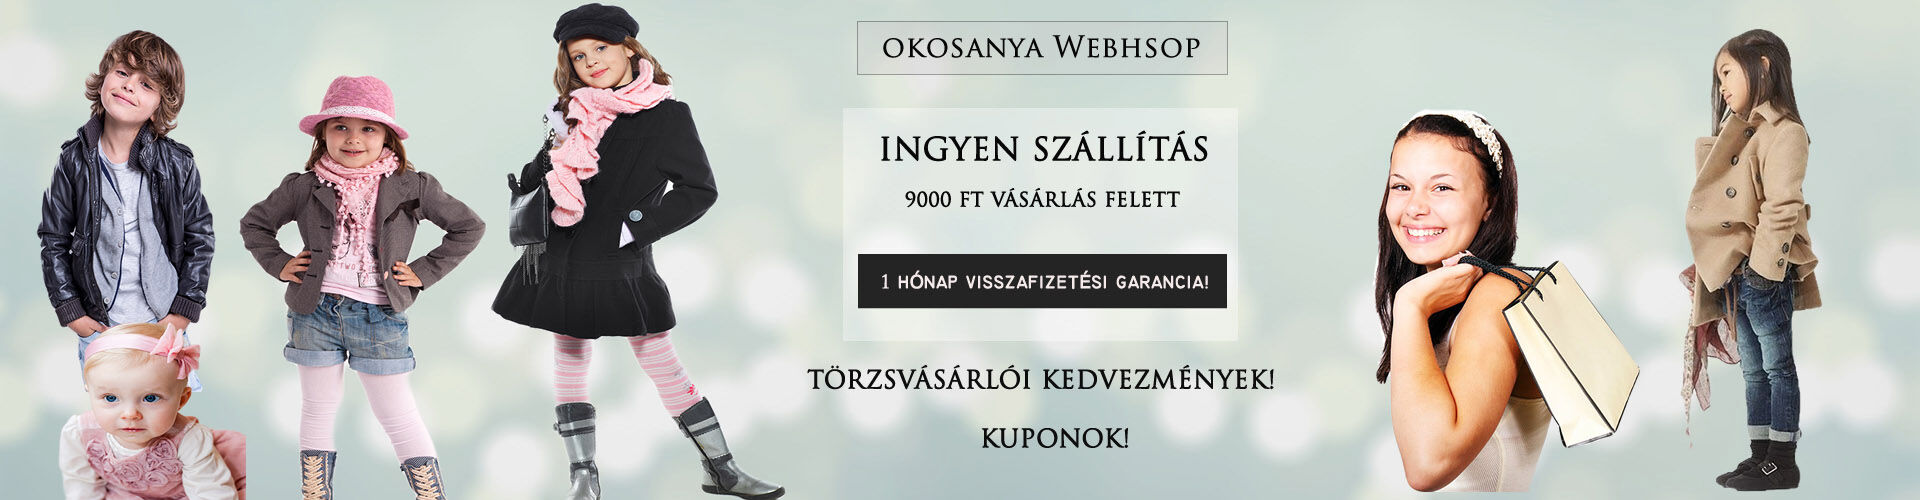 Okosanya